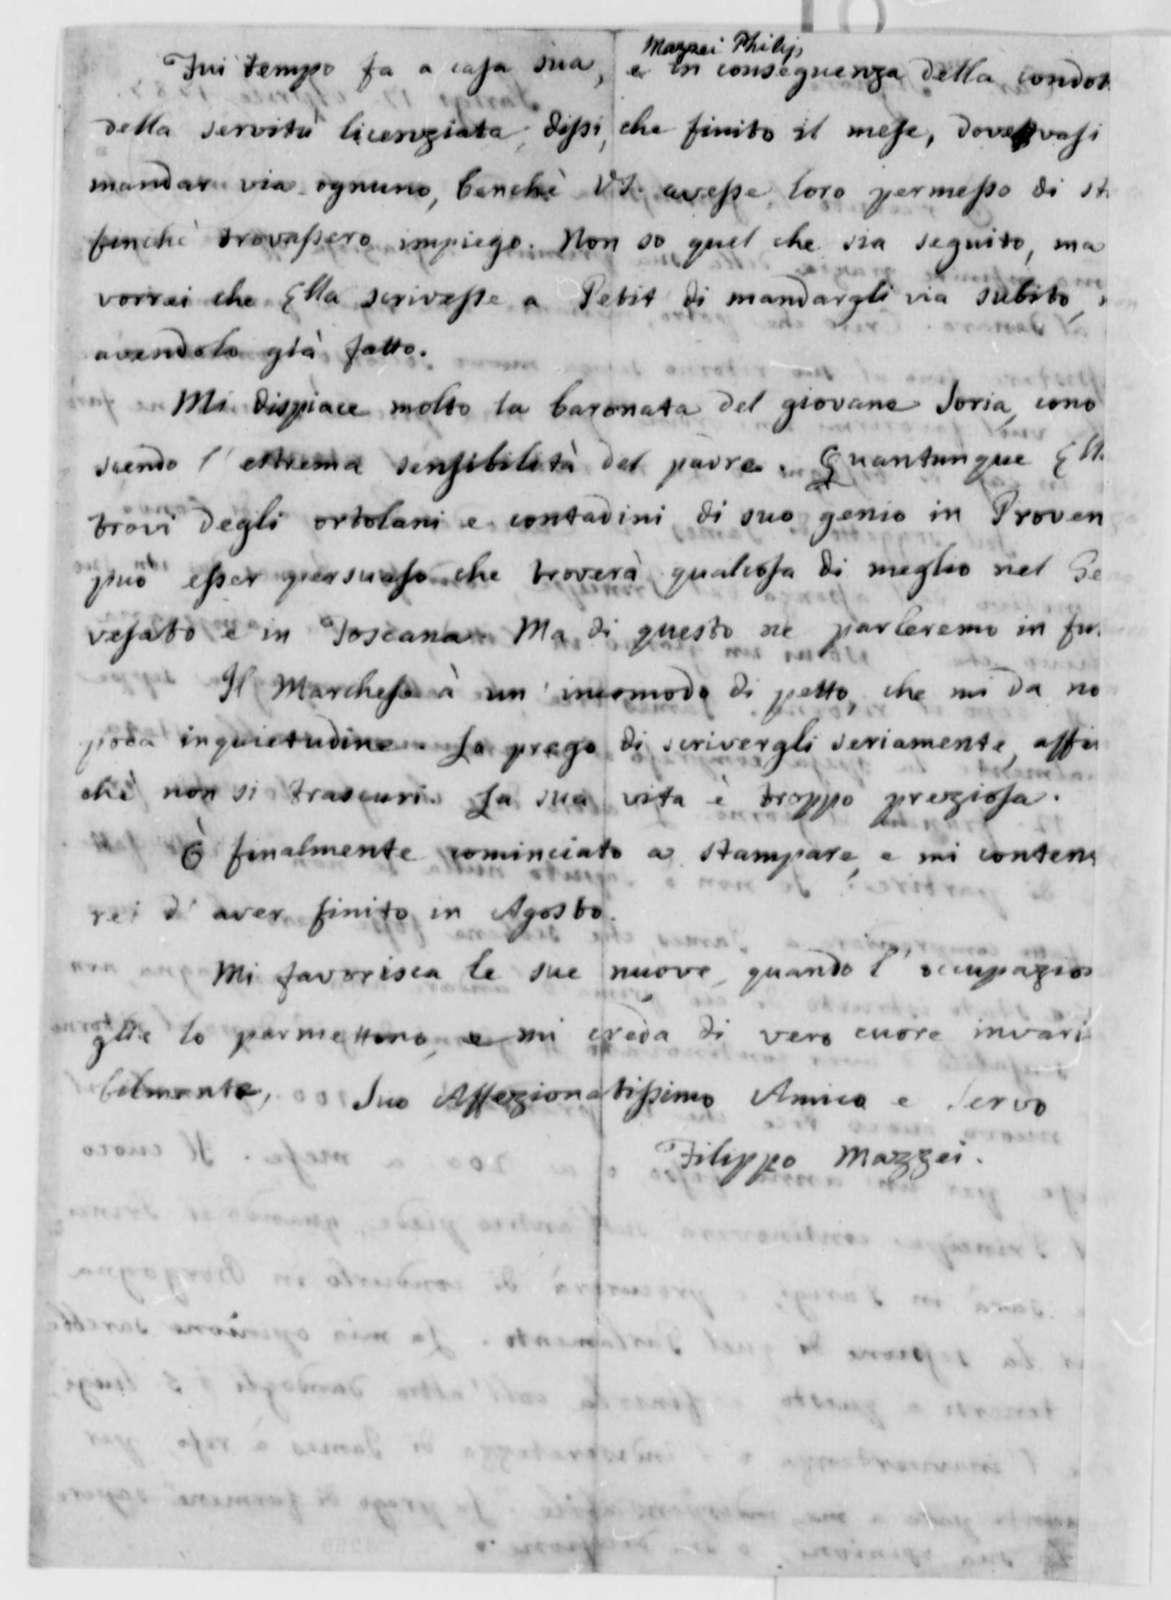 Philip Mazzei to Thomas Jefferson, April 17, 1787, in Italian